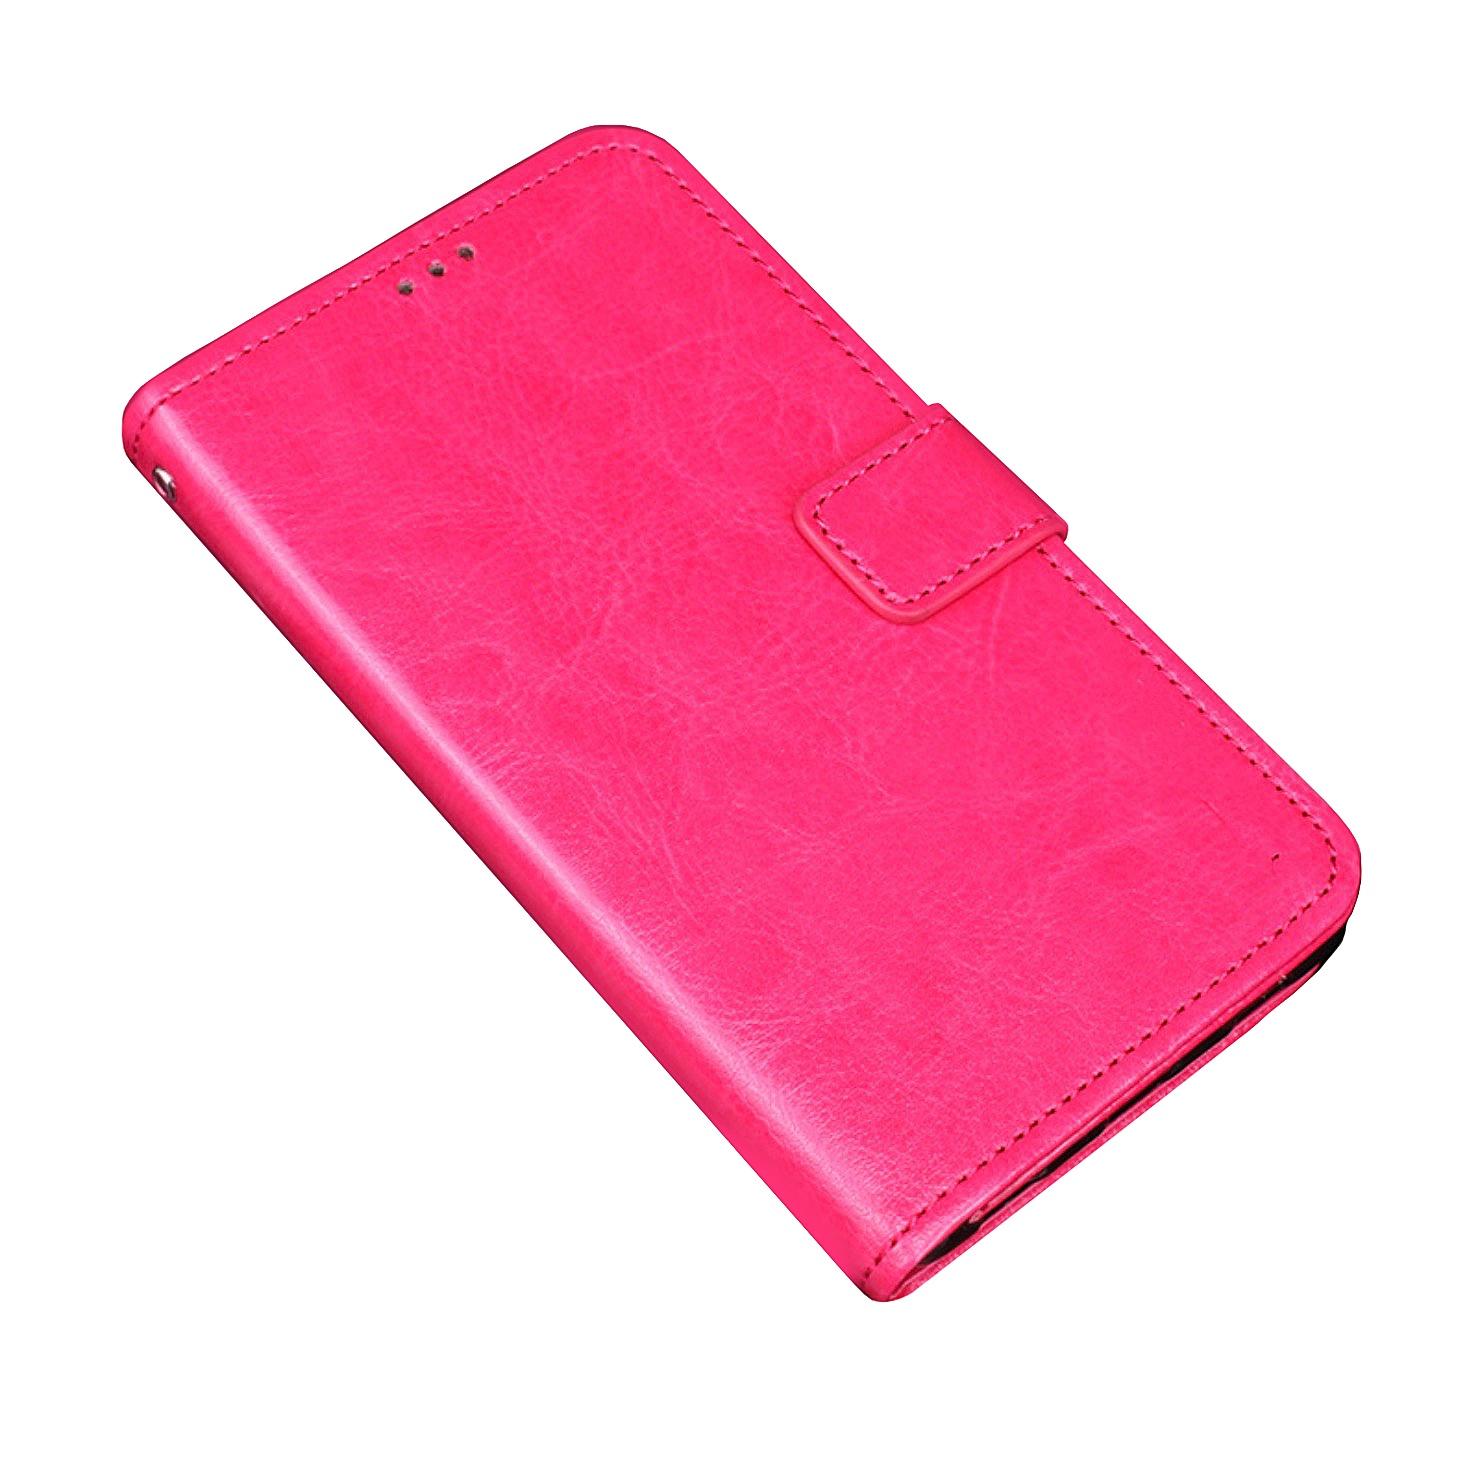 купить Чехол-книжка MyPads для ZTE Nubia N2 с мульти-подставкой застёжкой и визитницей розовый онлайн